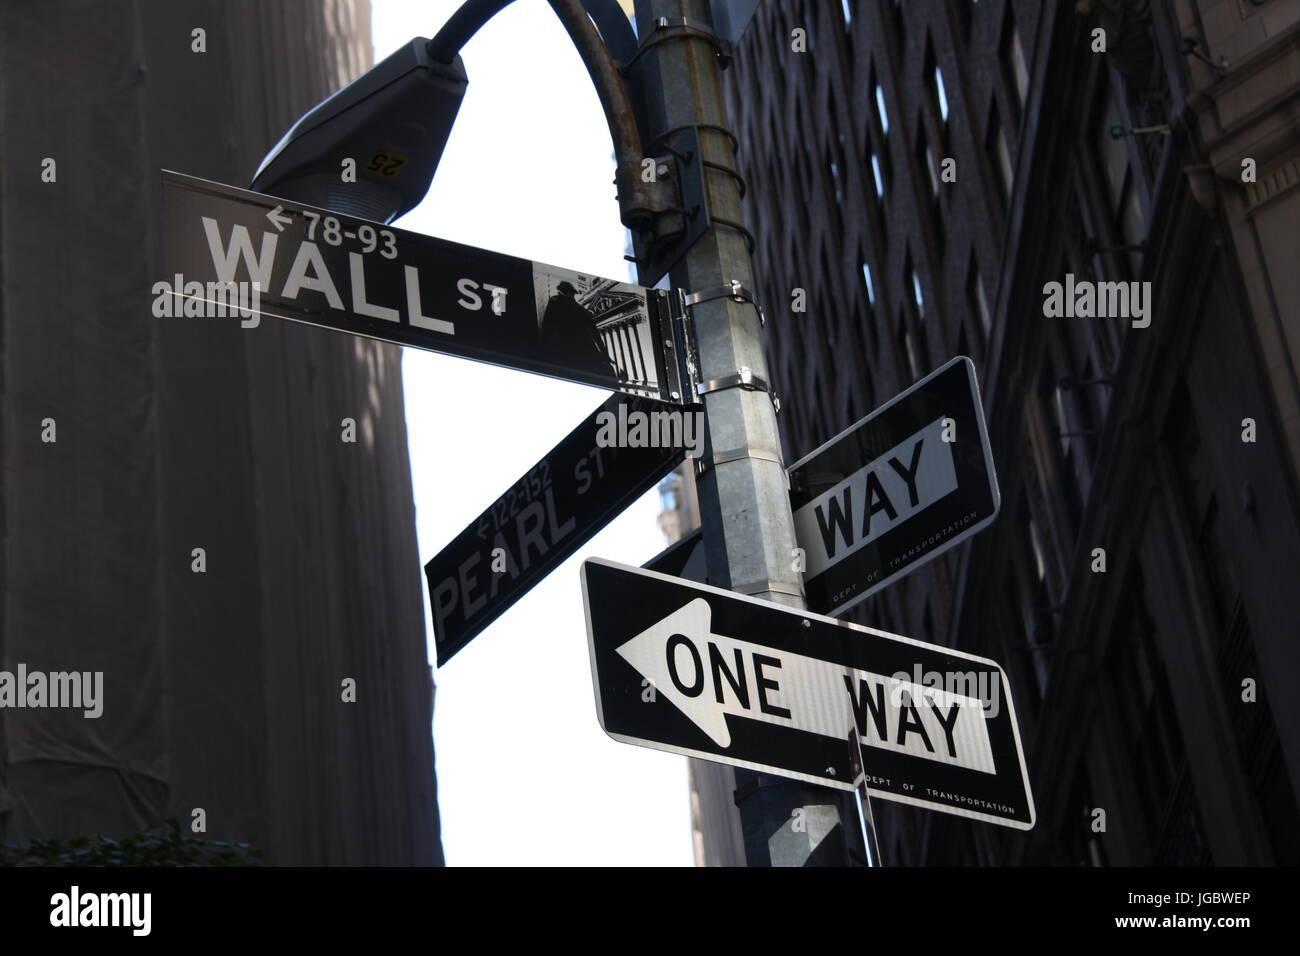 Wall Street One Way - Stock Image